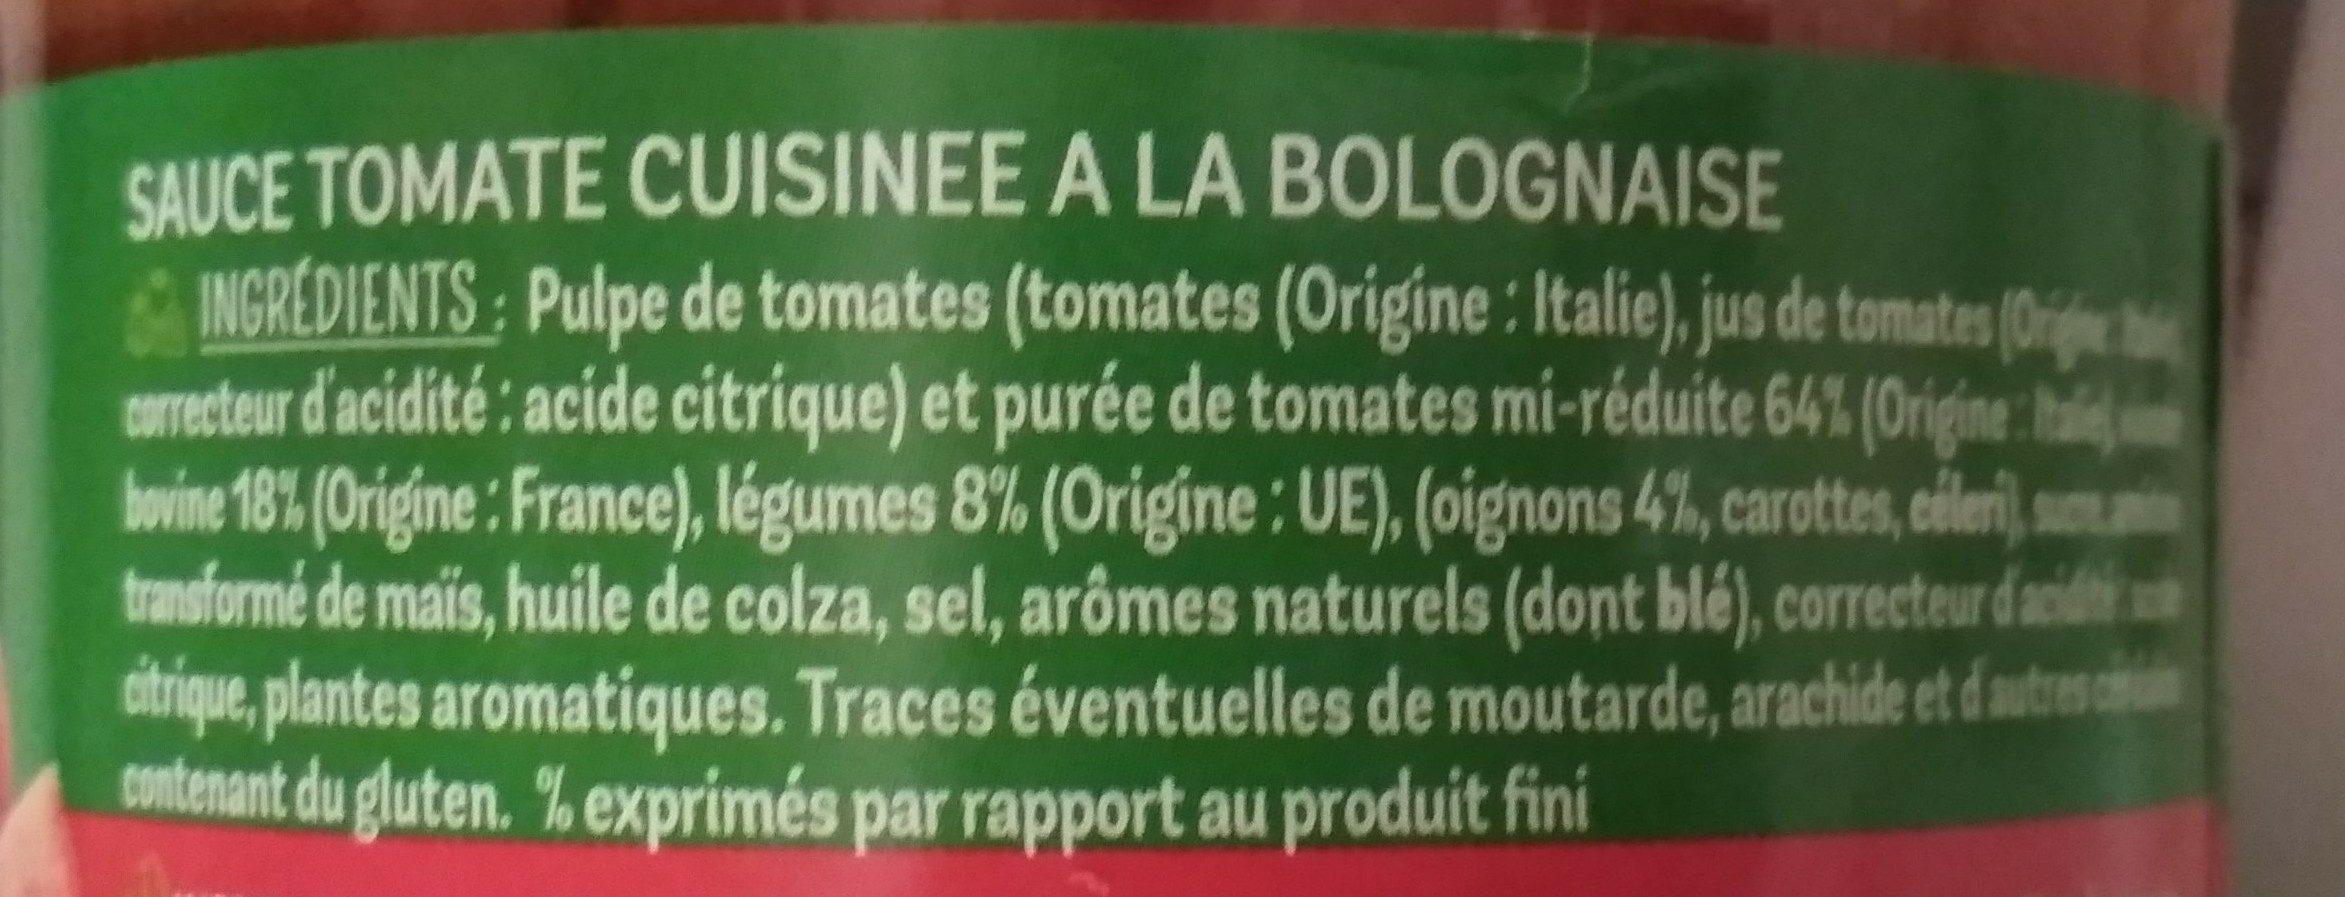 Sauce Bolognaise - Ingredients - fr